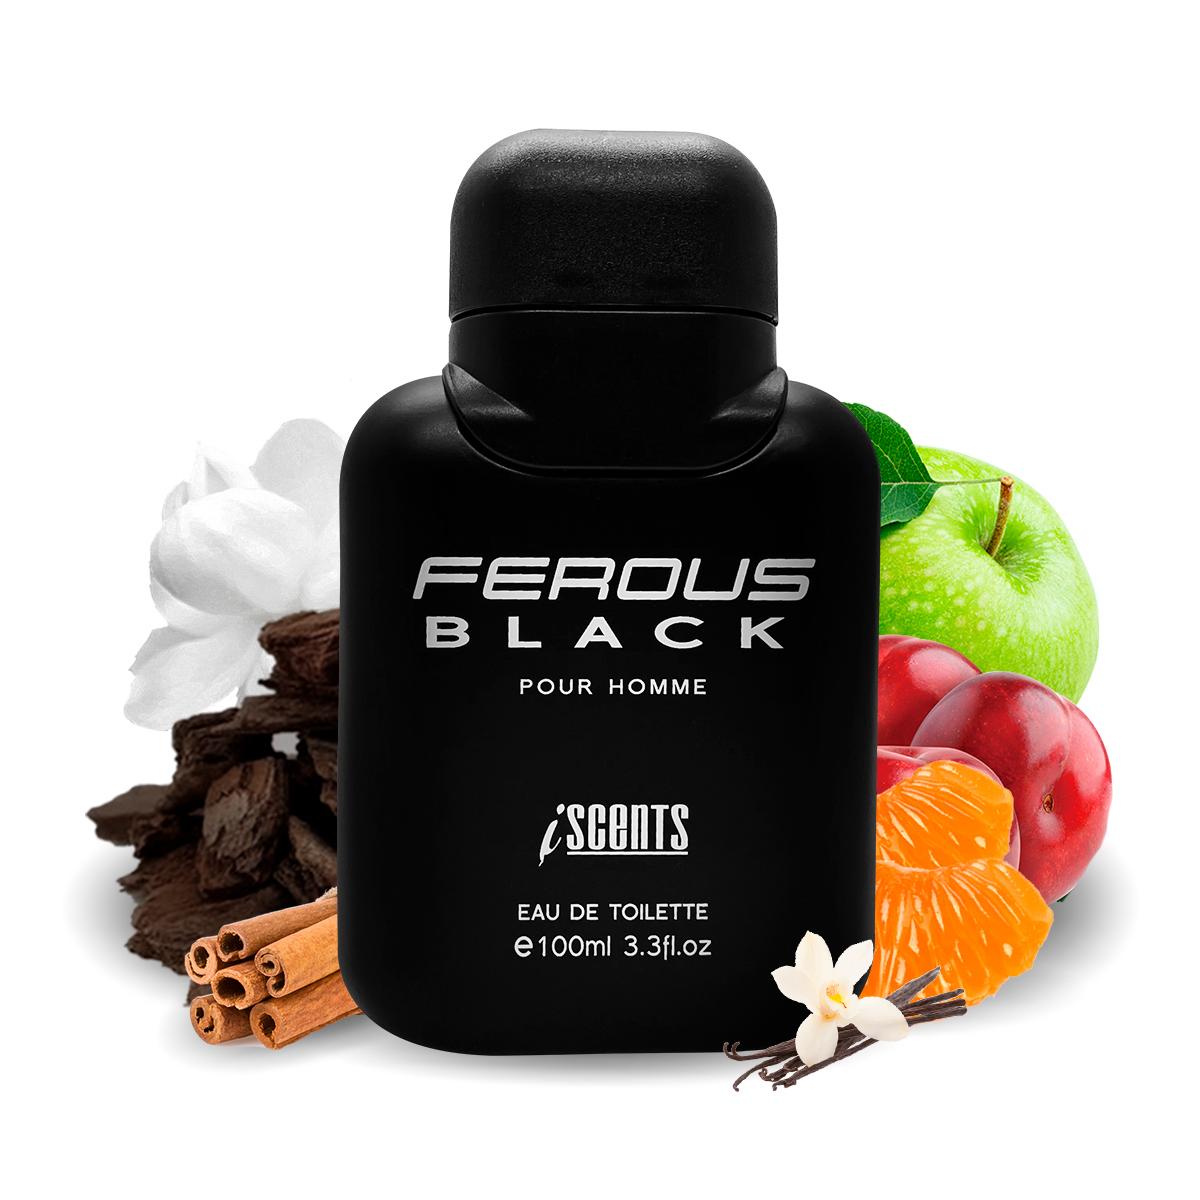 Kit 2 Perfumes Importados Red Royal e Ferous Black I Scents